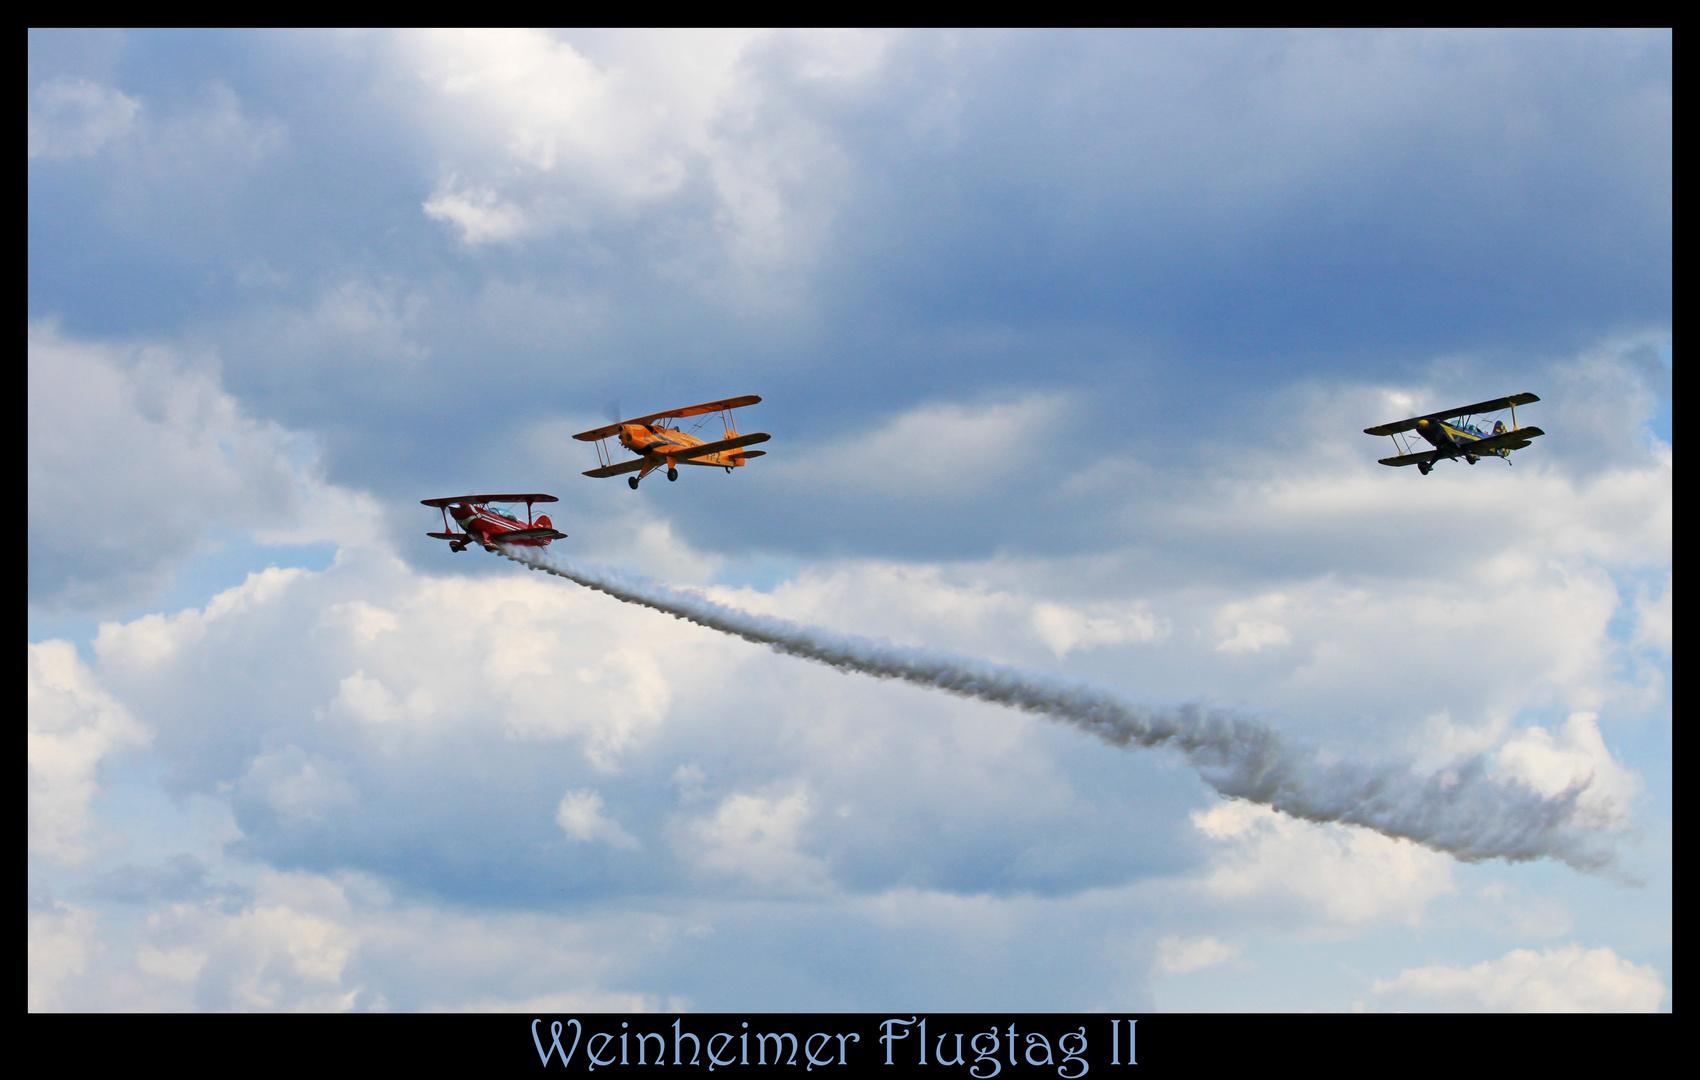 Weinheimer Flugtag II